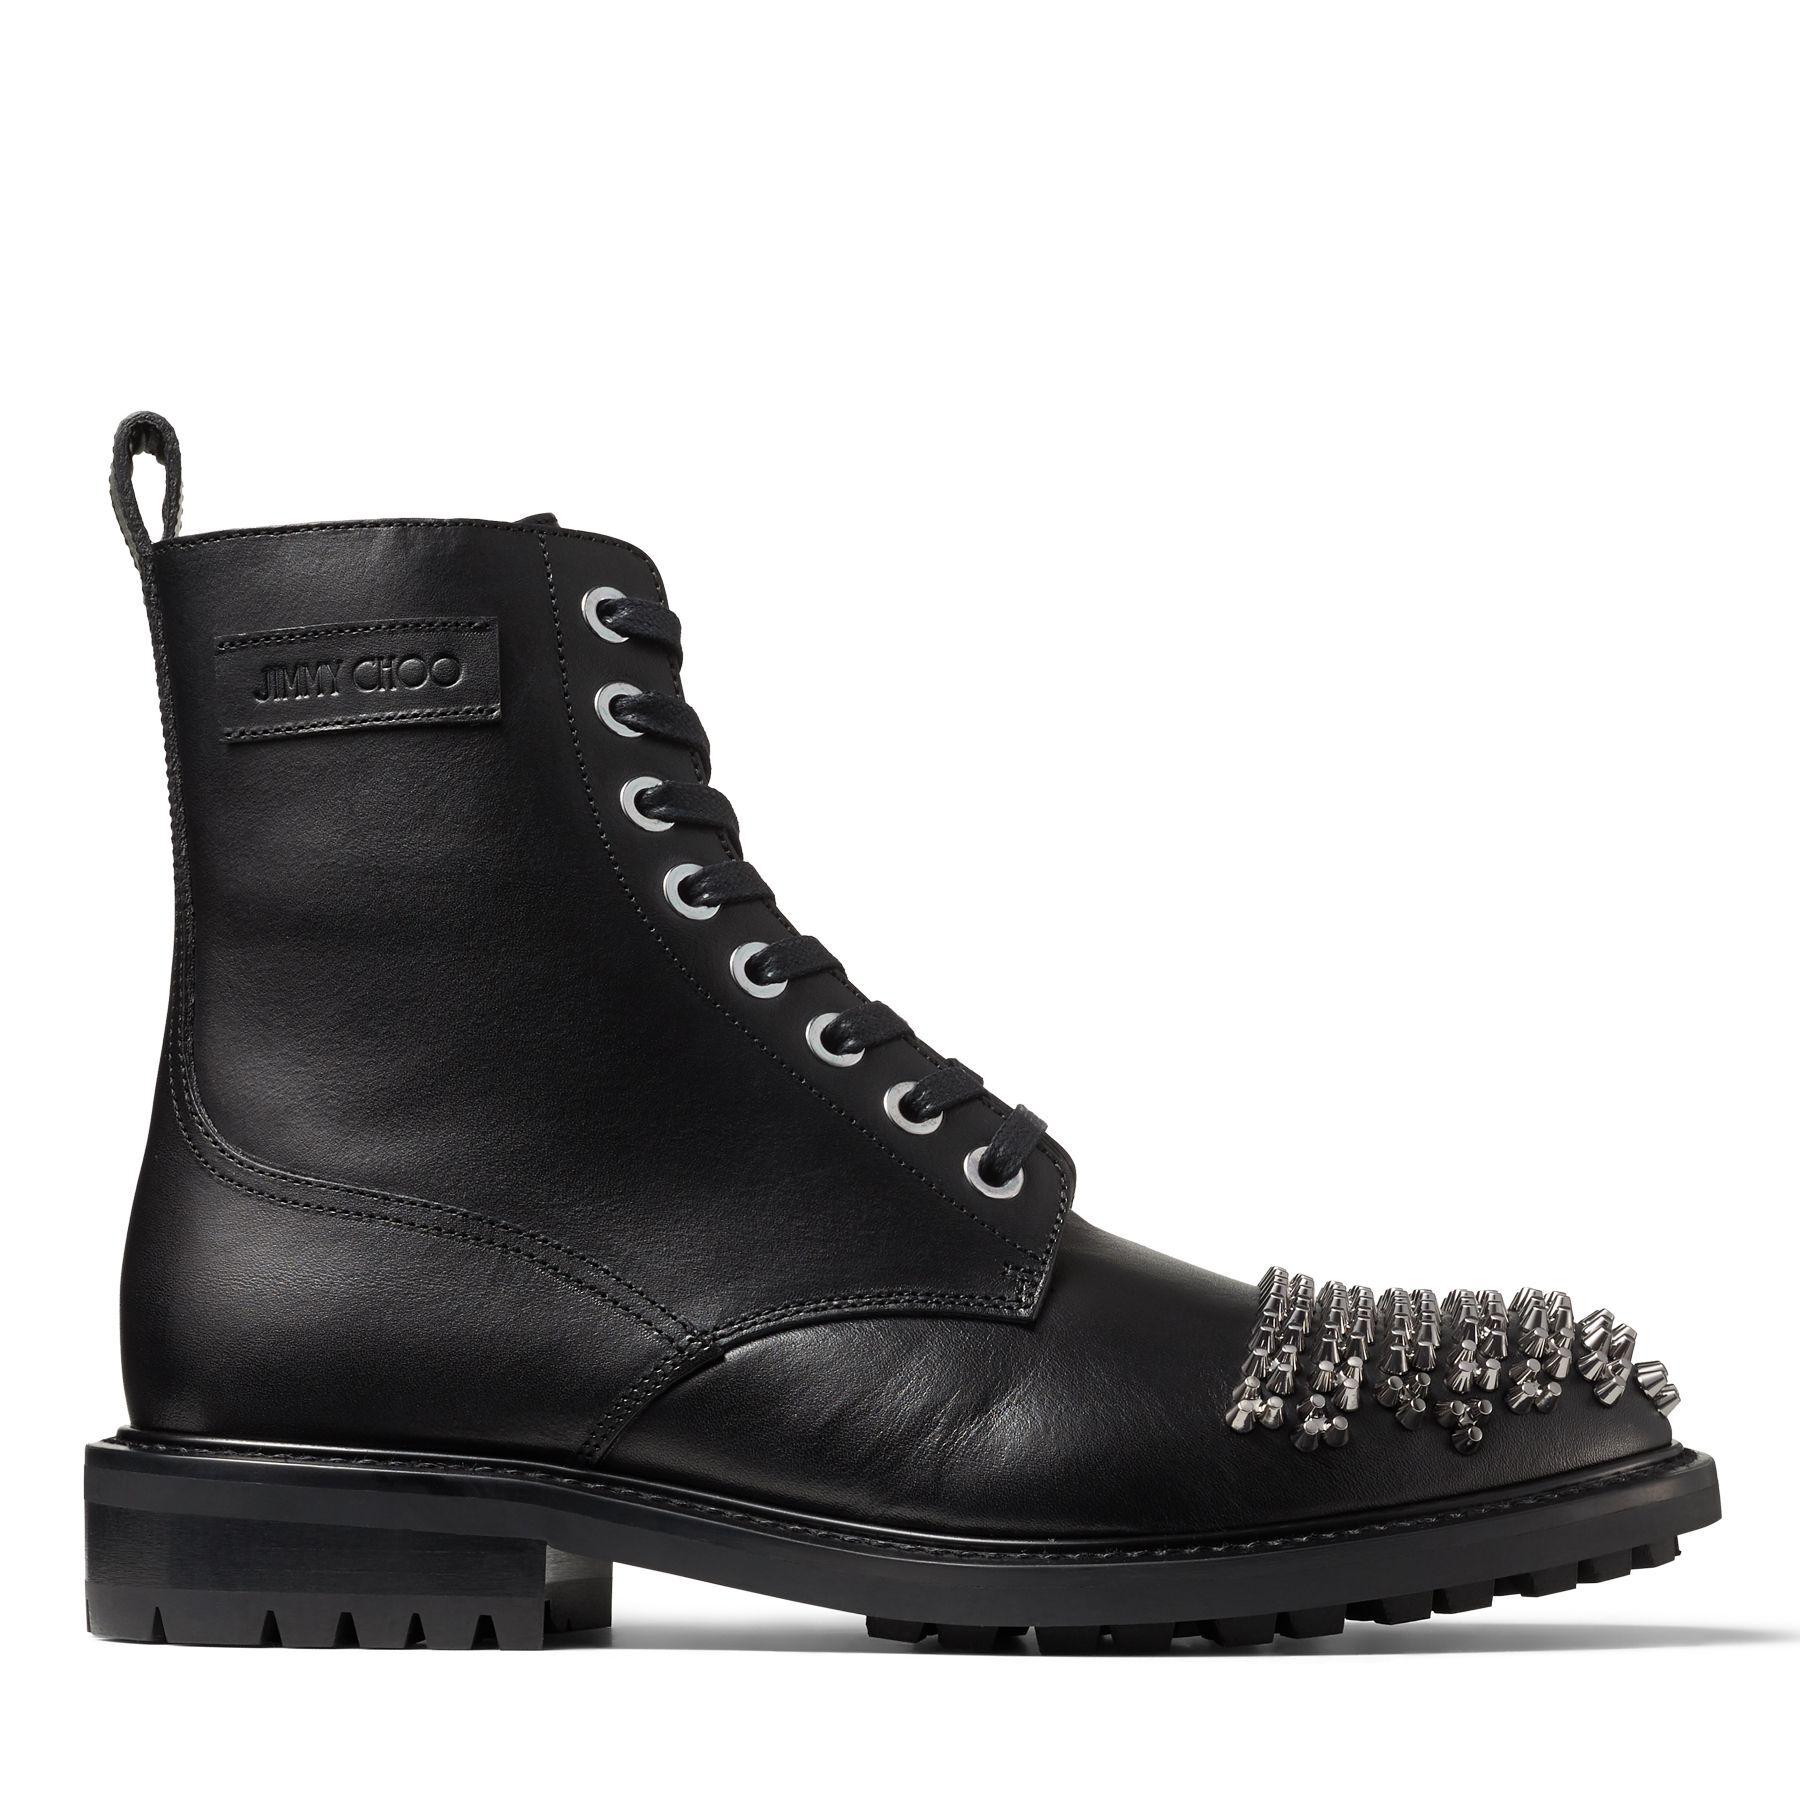 TURING/M - Black Shiny Vacchetta Boots with Studs